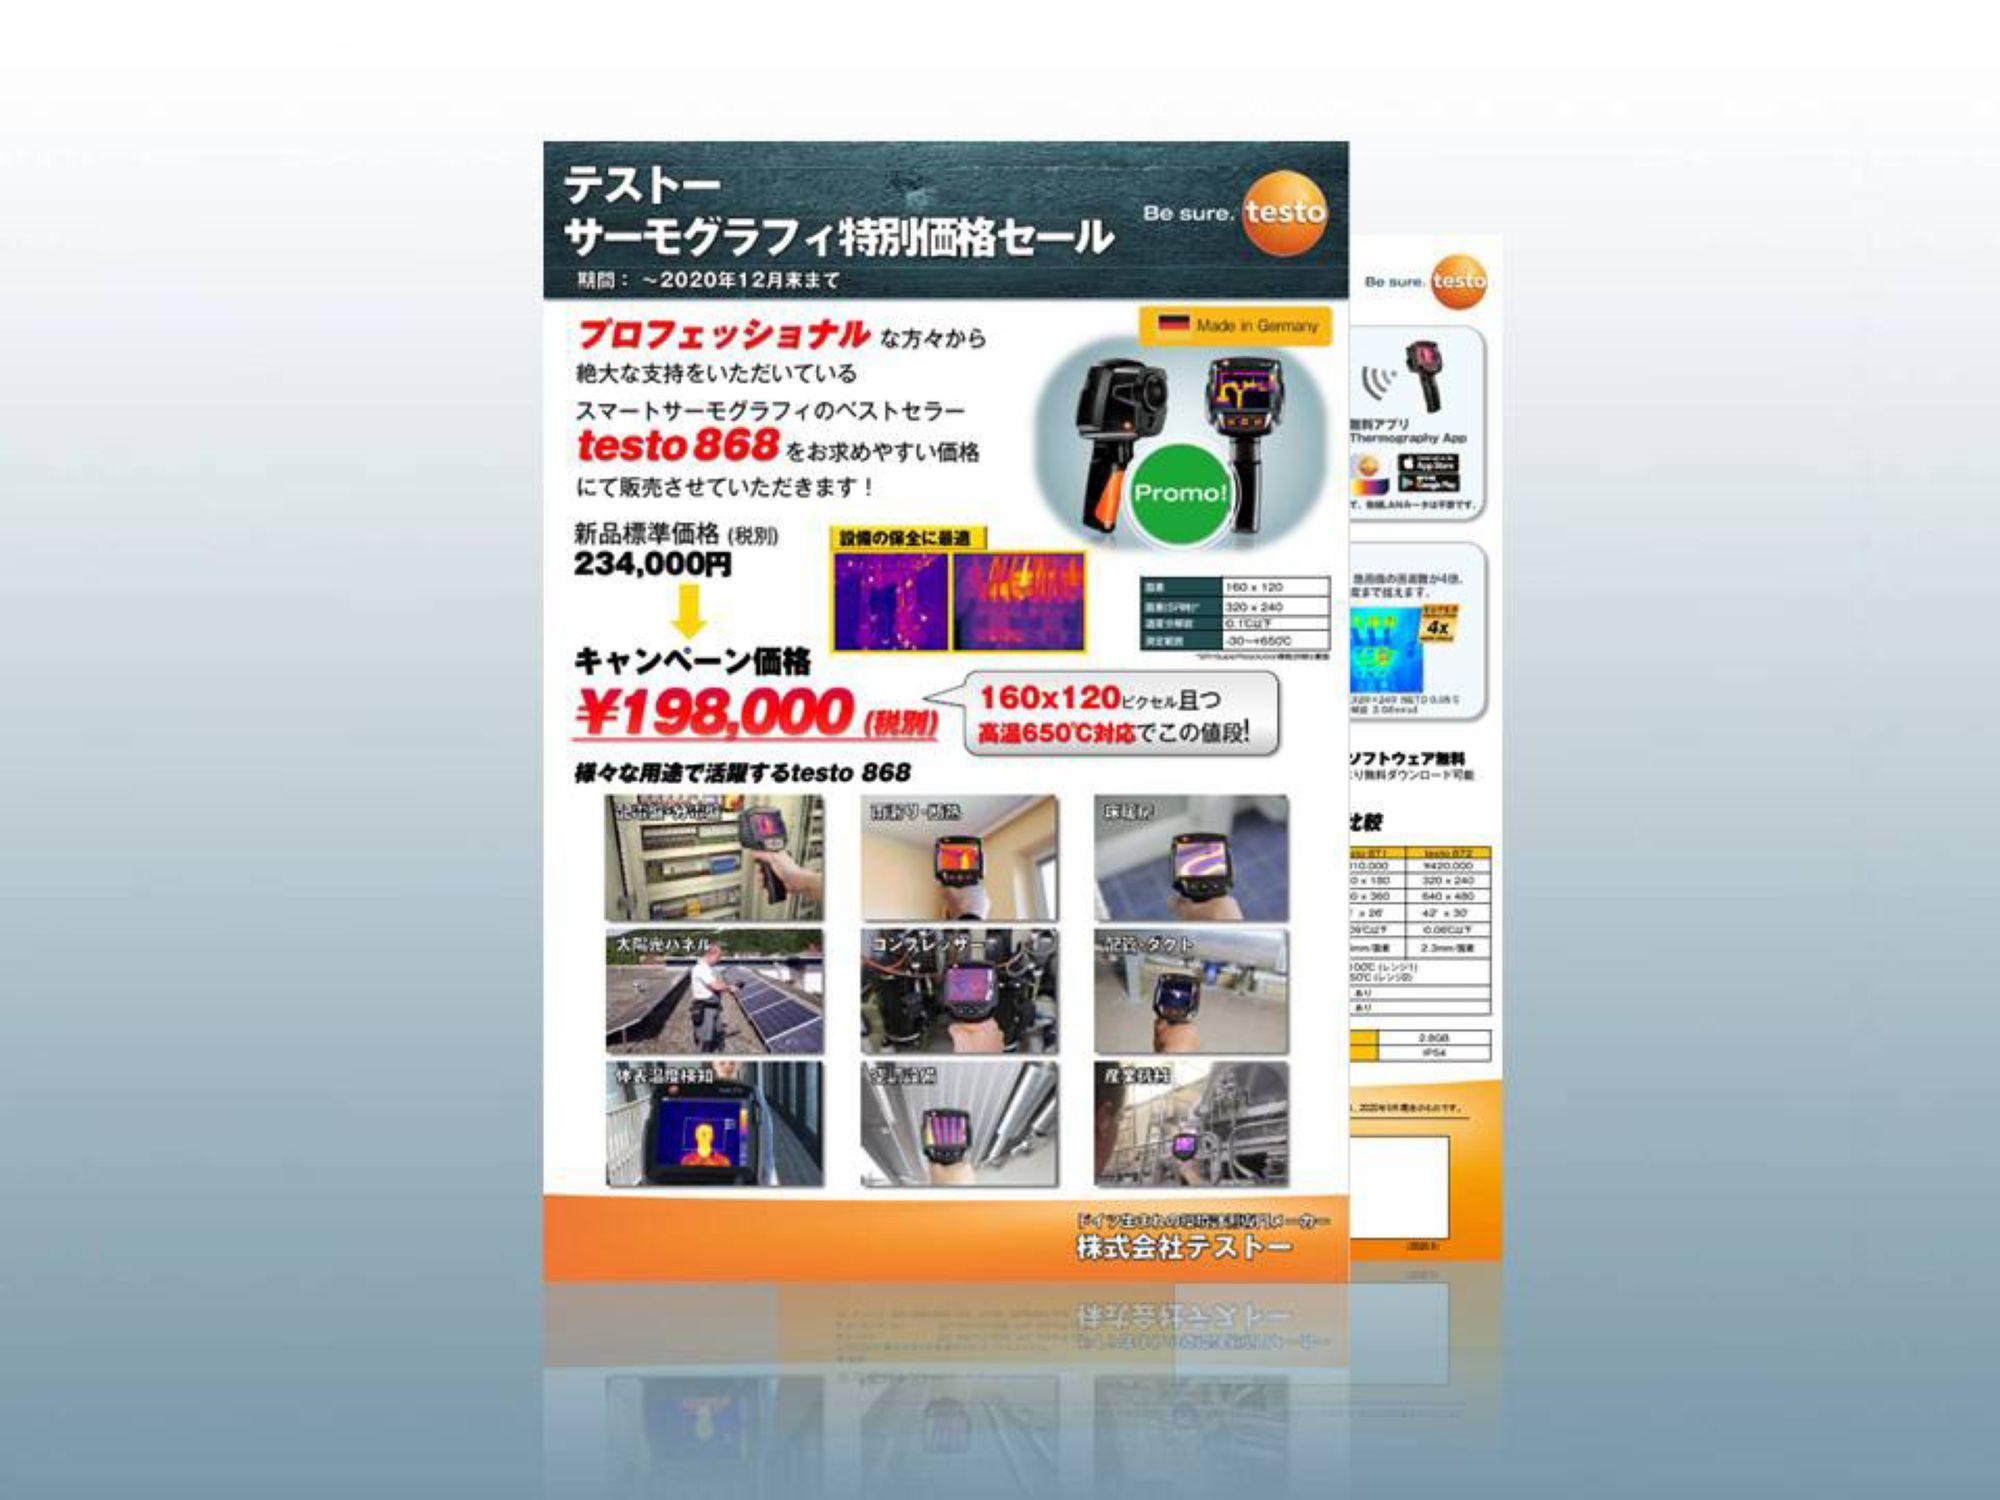 jp_testo 868promo_thumbnail.jpg